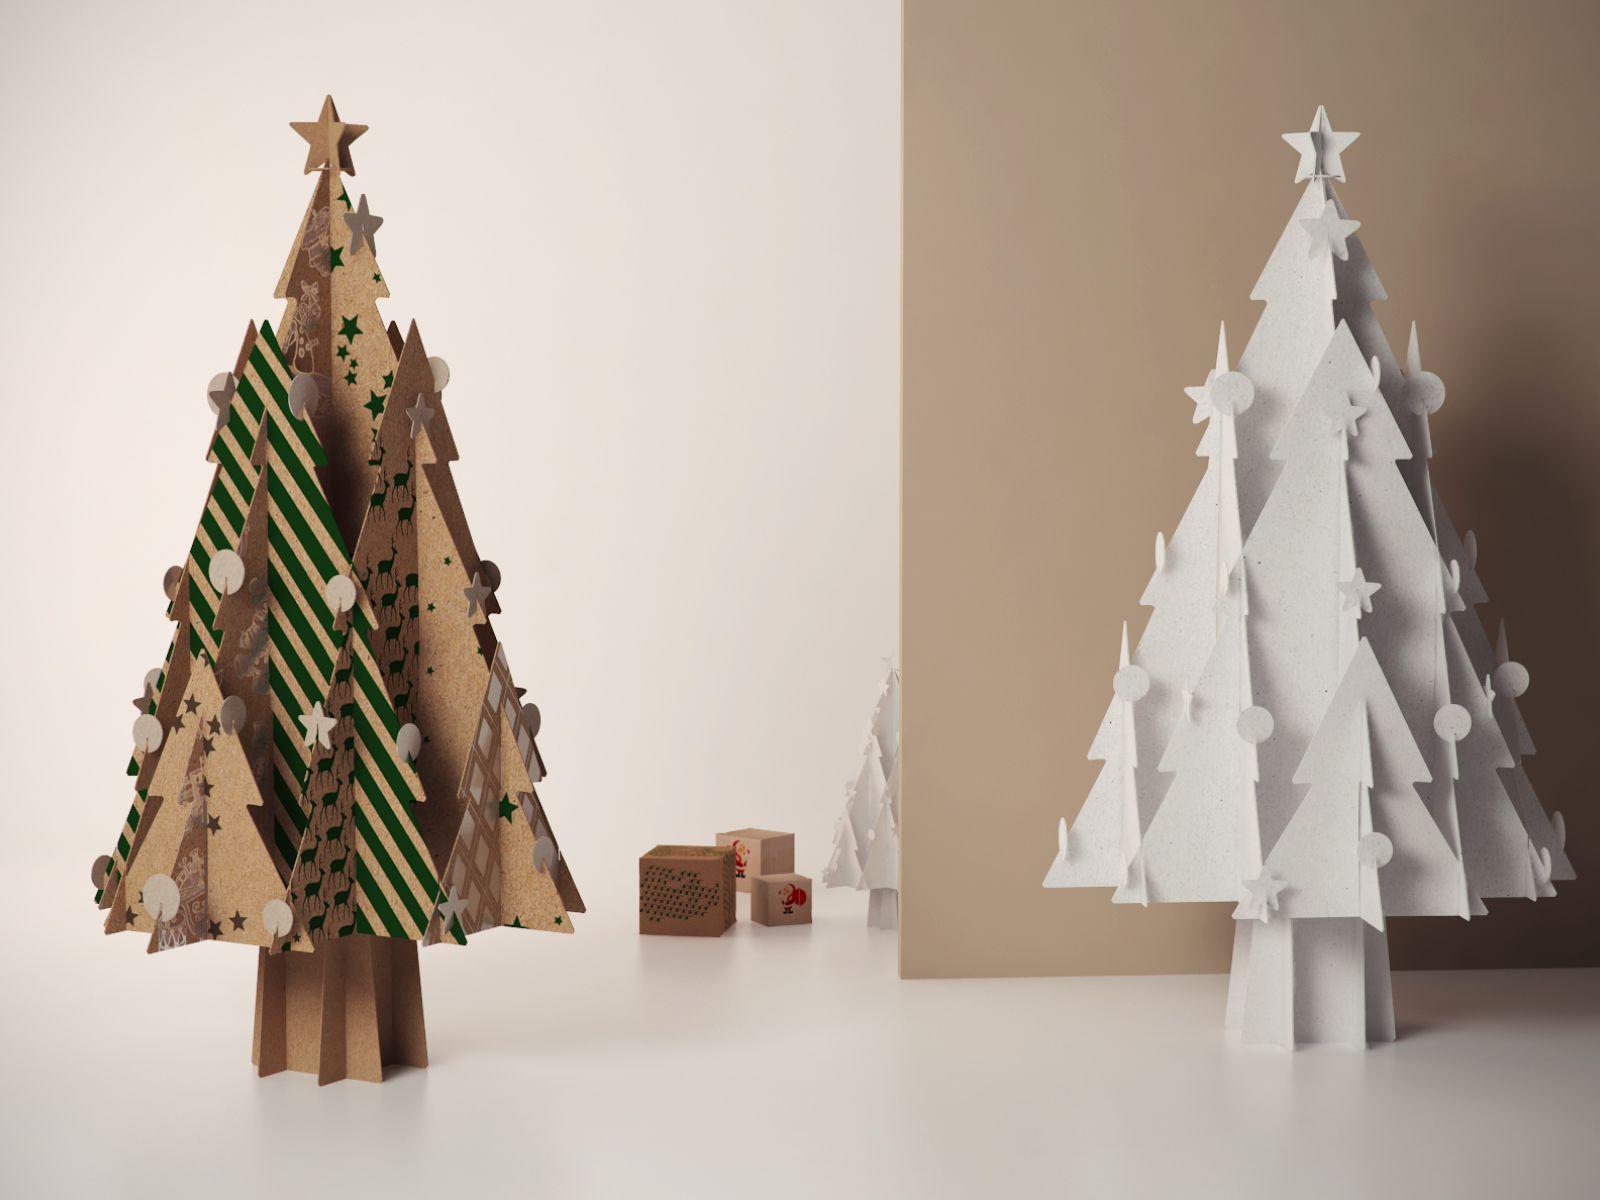 Dc Free 3d Model Of Cardboard Christmas Tree Cardboard Christmas Tree Christmas Tree Christmas Tree Star